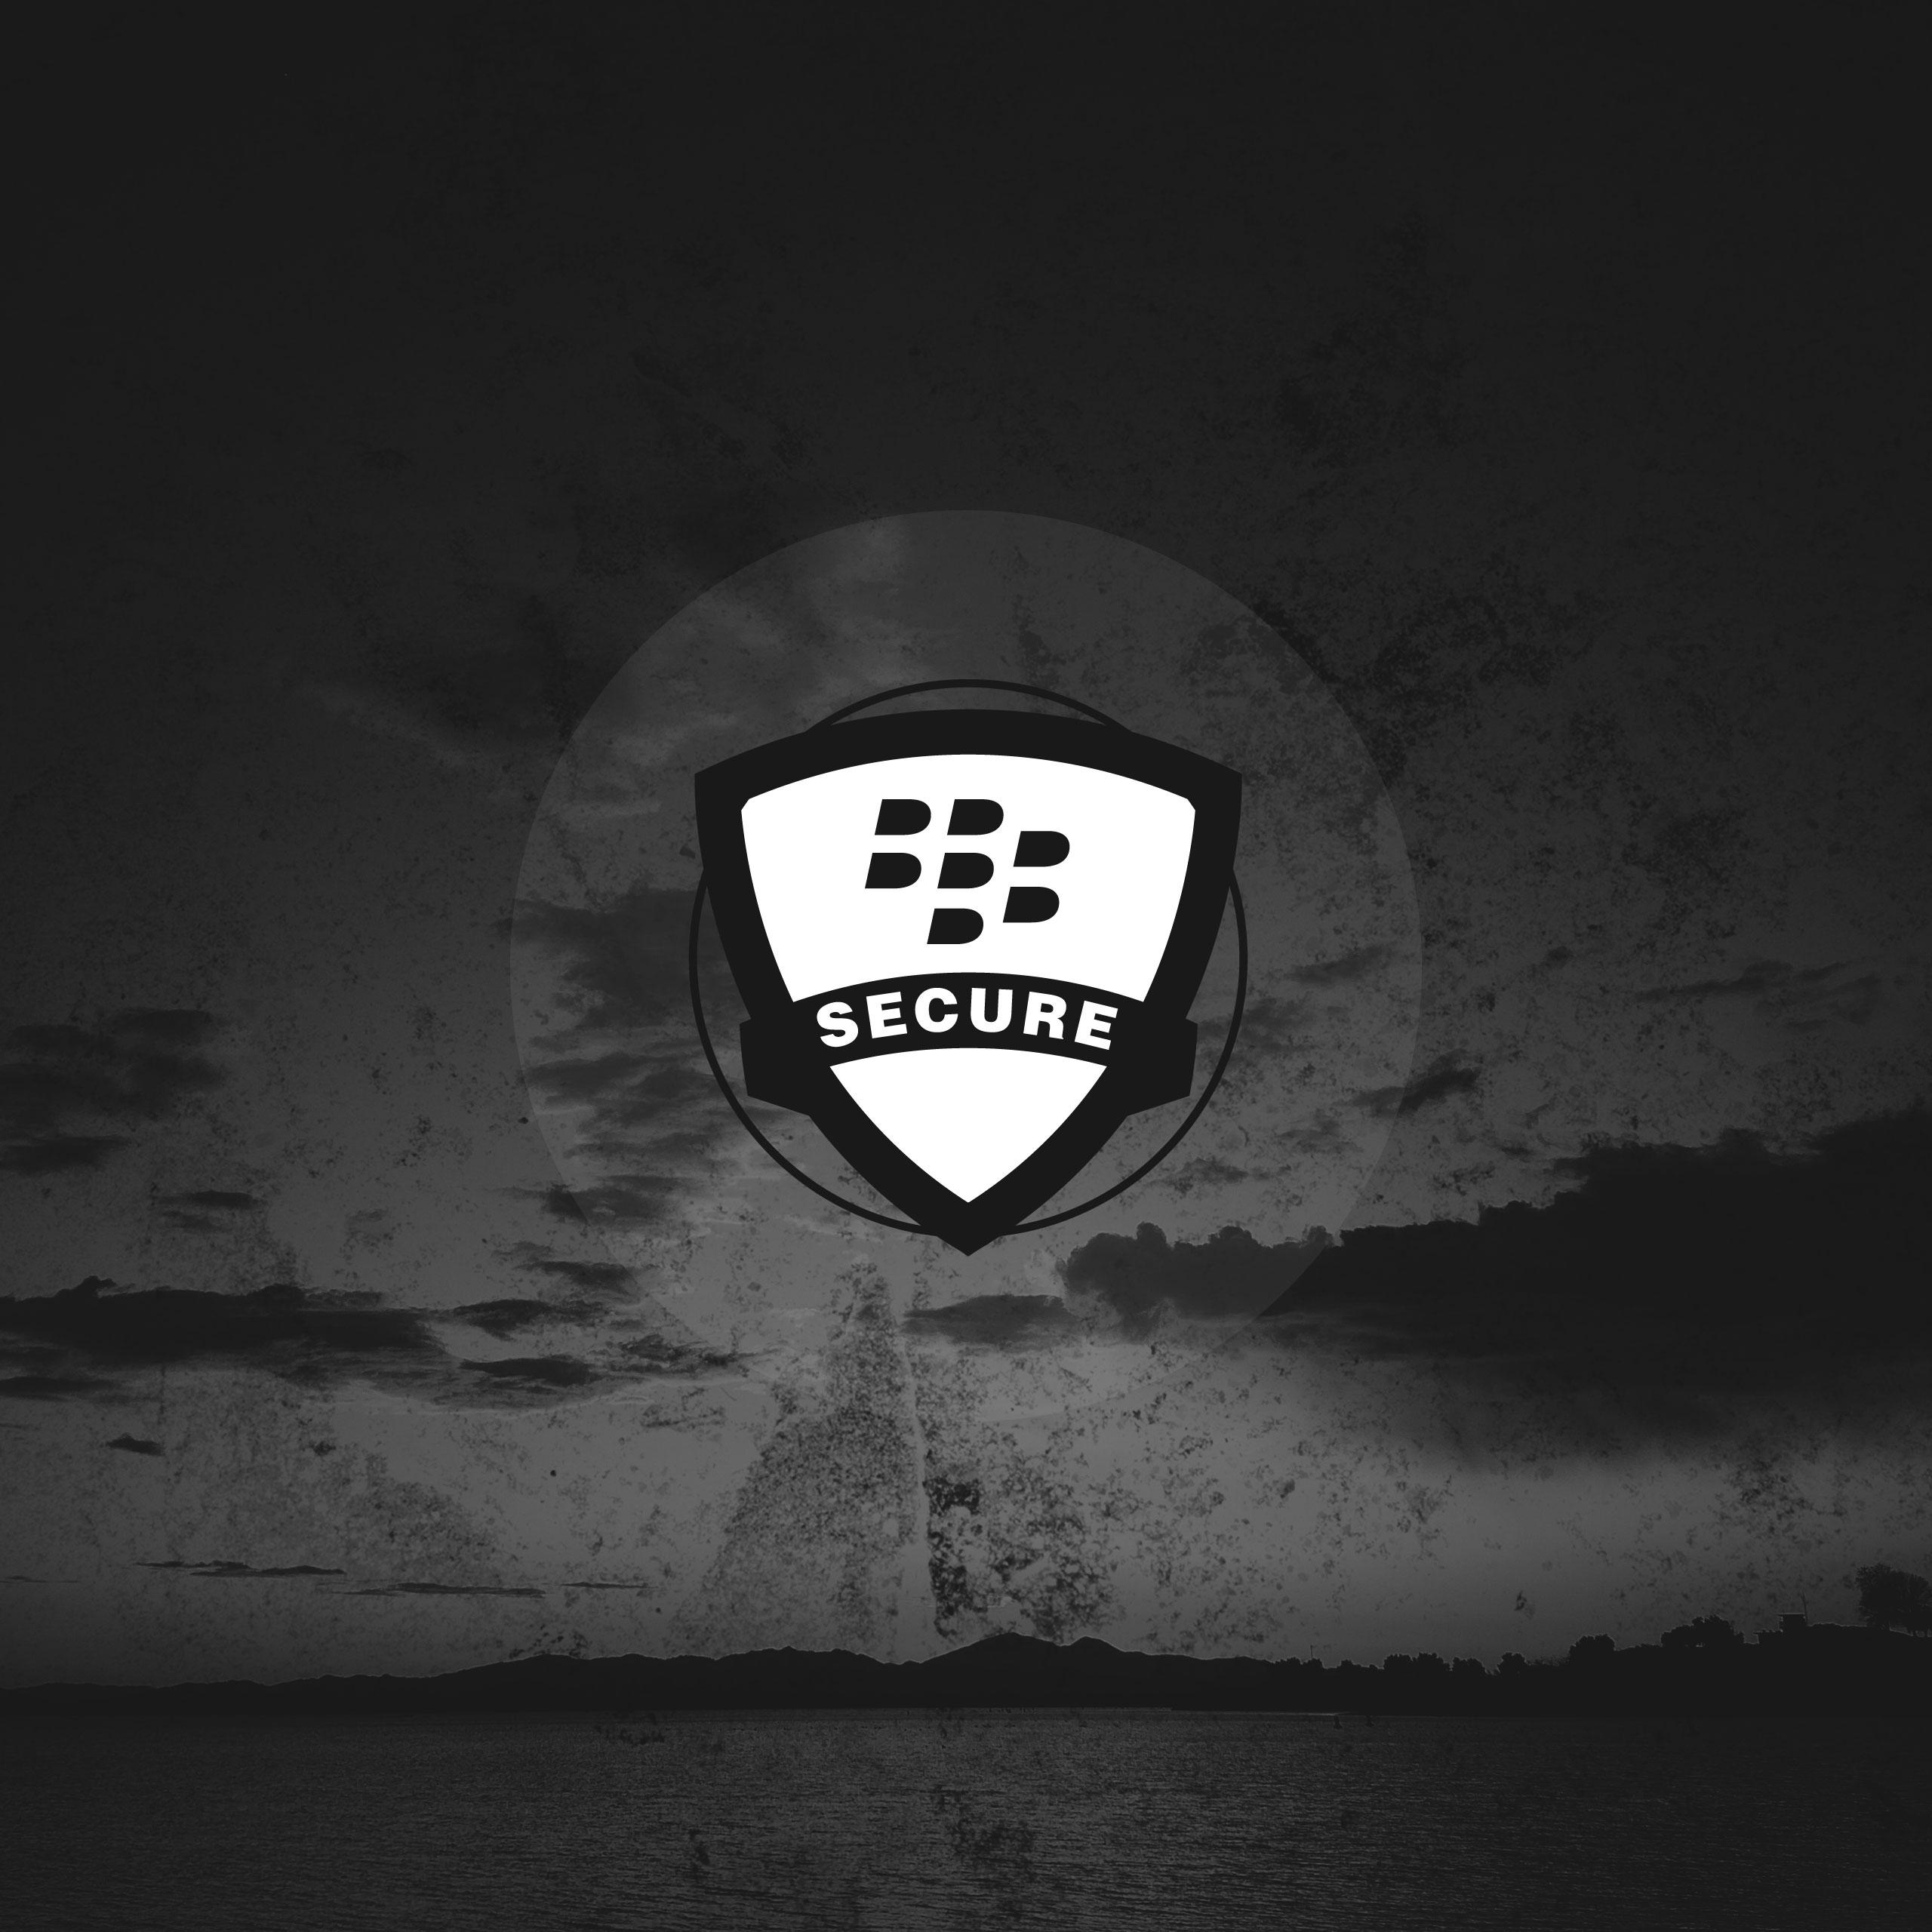 Download this BlackBerry Secure wallpaper CrackBerrycom 2560x2560